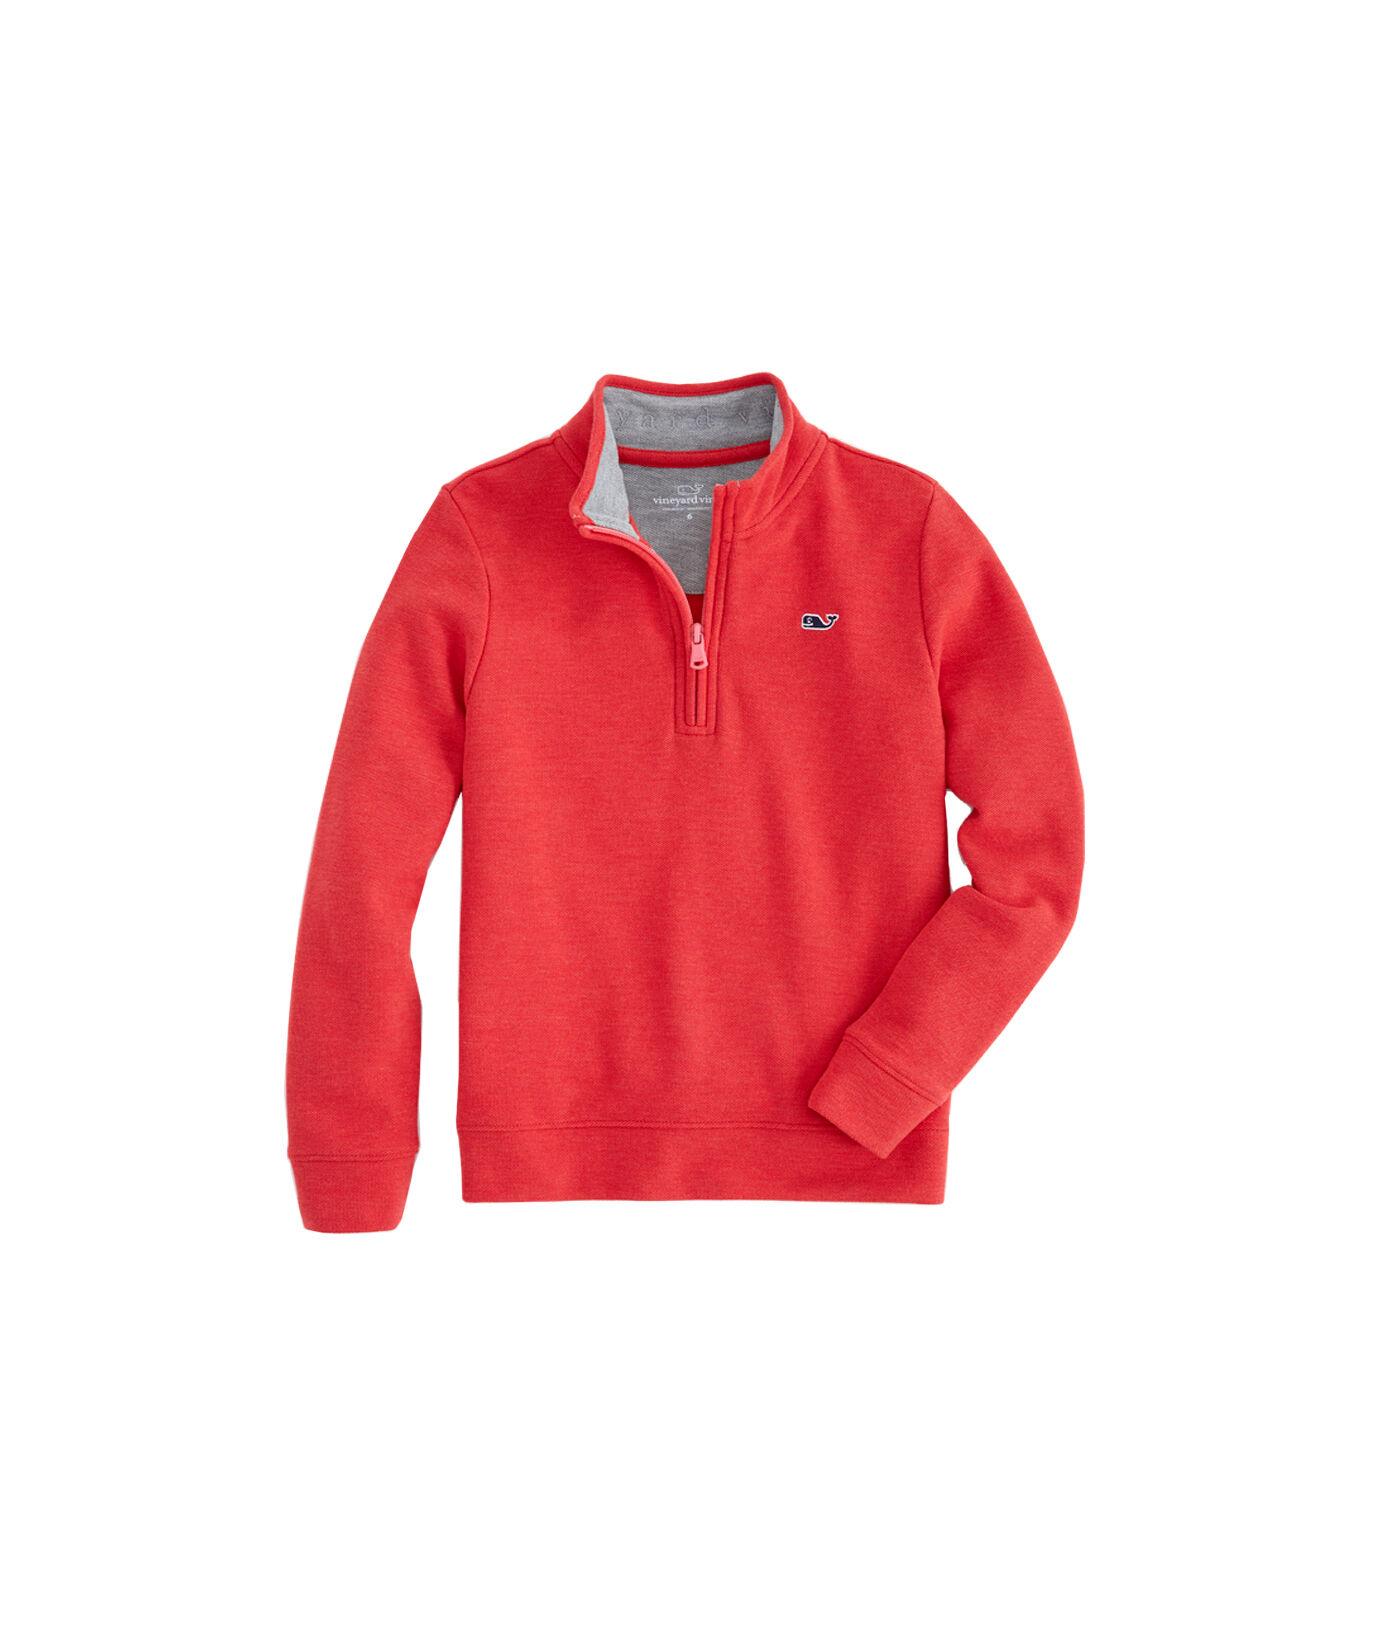 Boys saltwater zip also clothing shop preppy clothes for vineyard vines rh vineyardvines